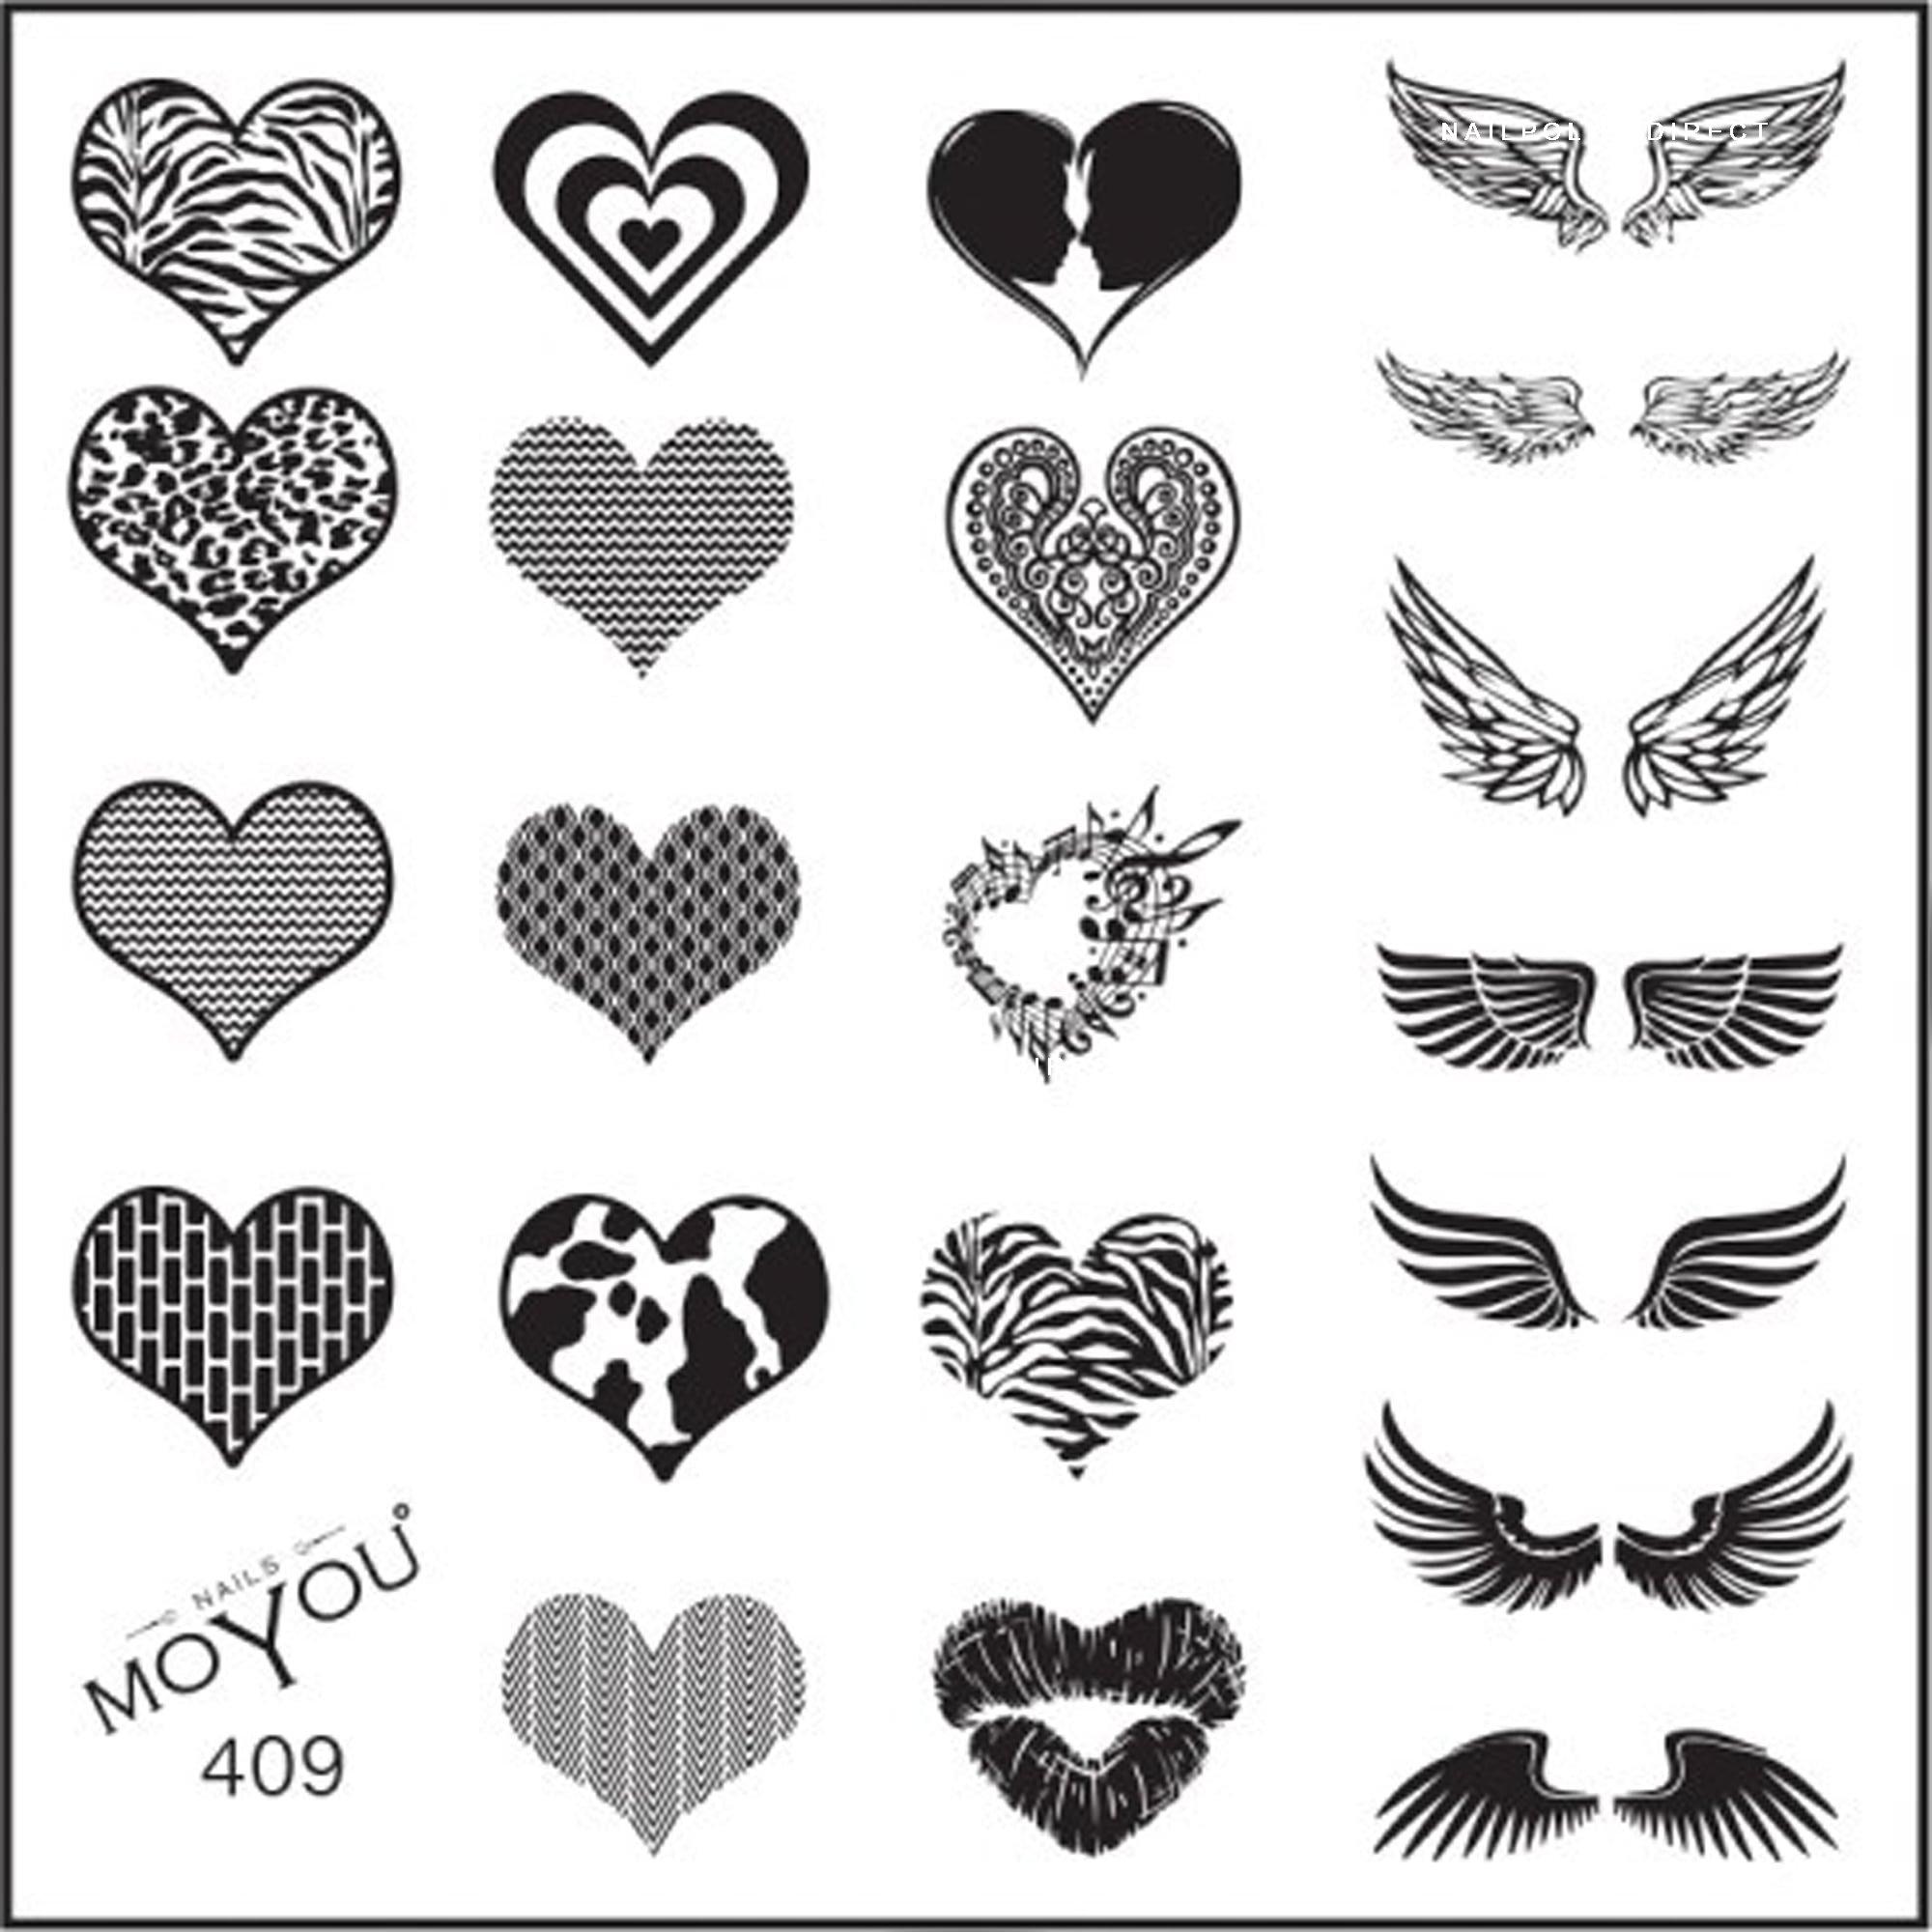 MoYou Stamping Nail Art Image Plate - Hearts & Wings - 409